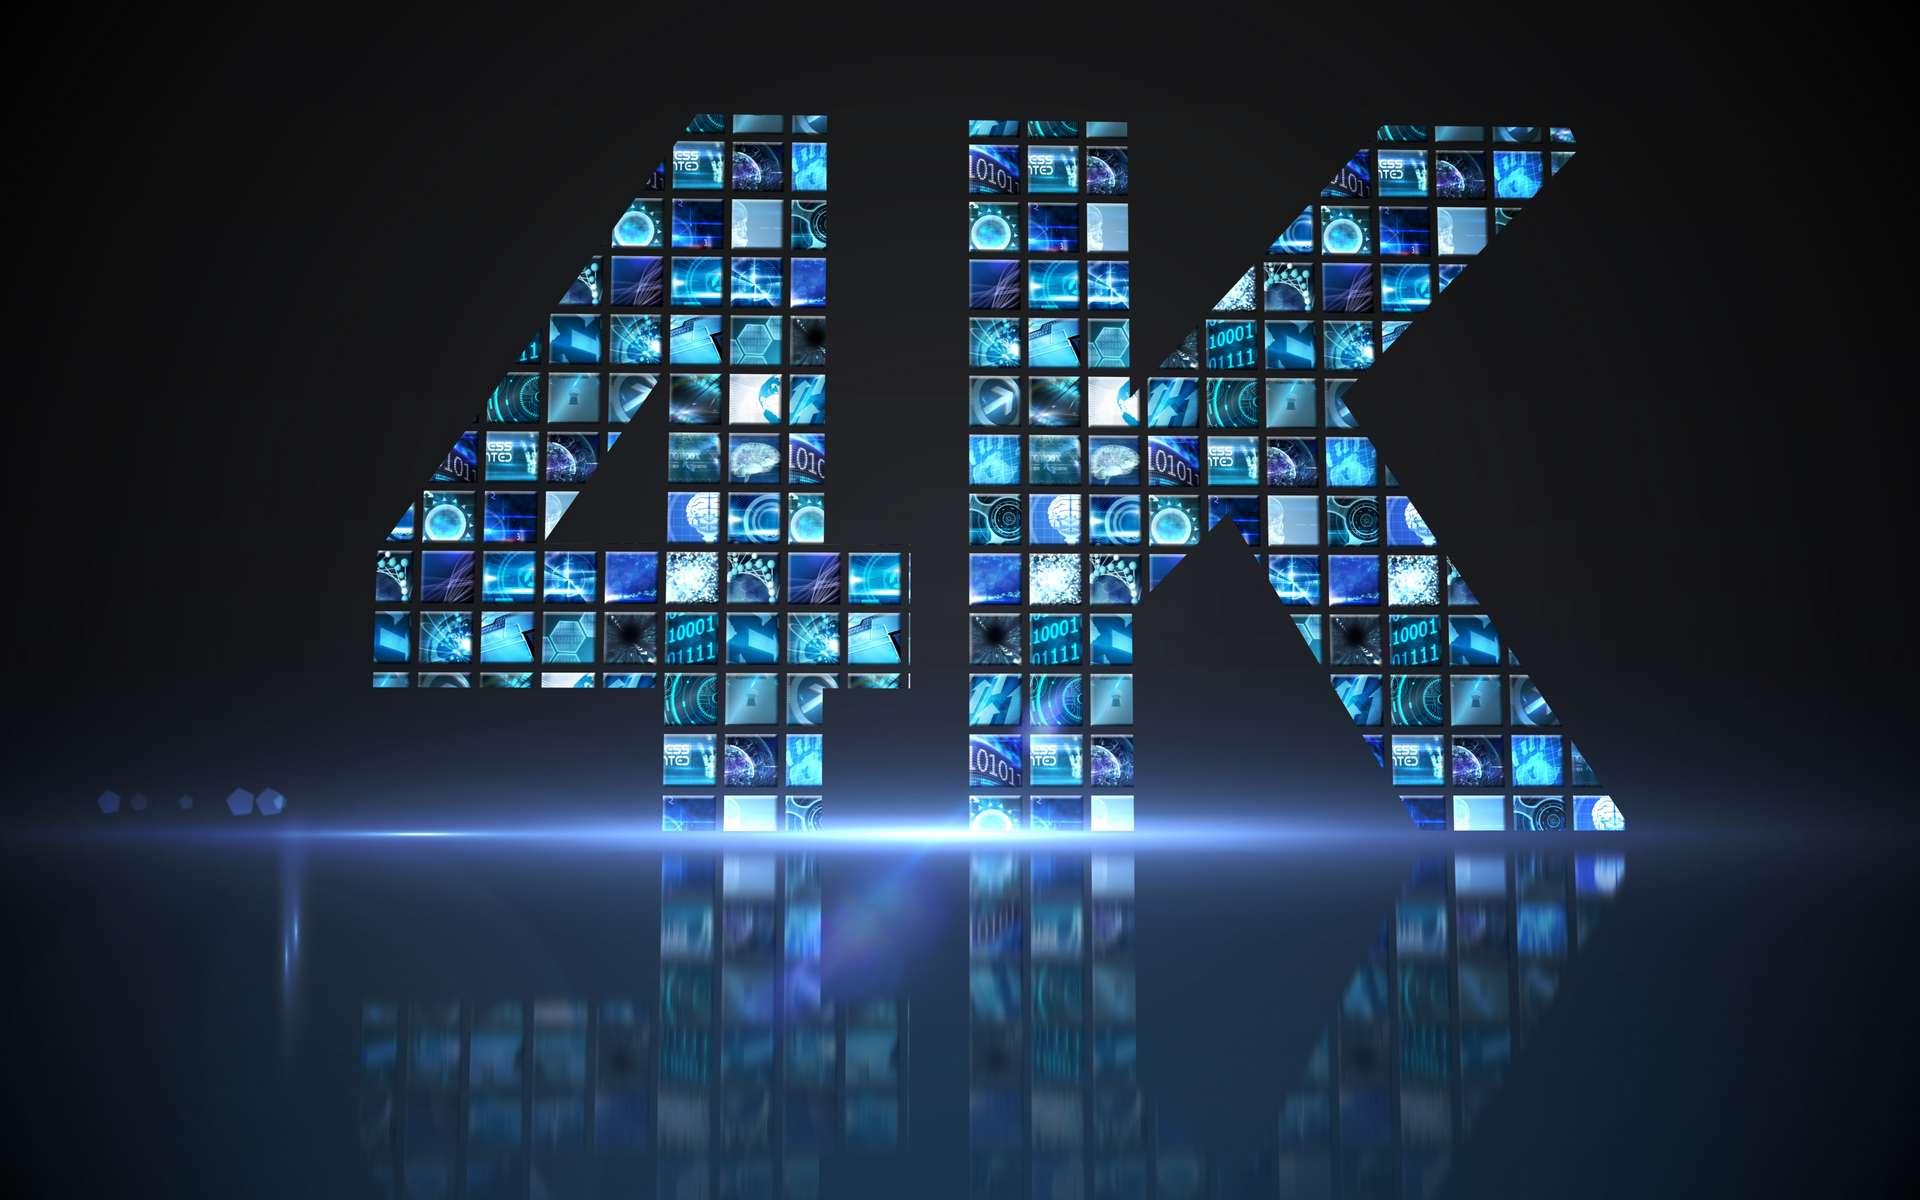 La résolution 4K ou Ulta Haute Définition. © WavebreakmediaMicro, Adobe Stock